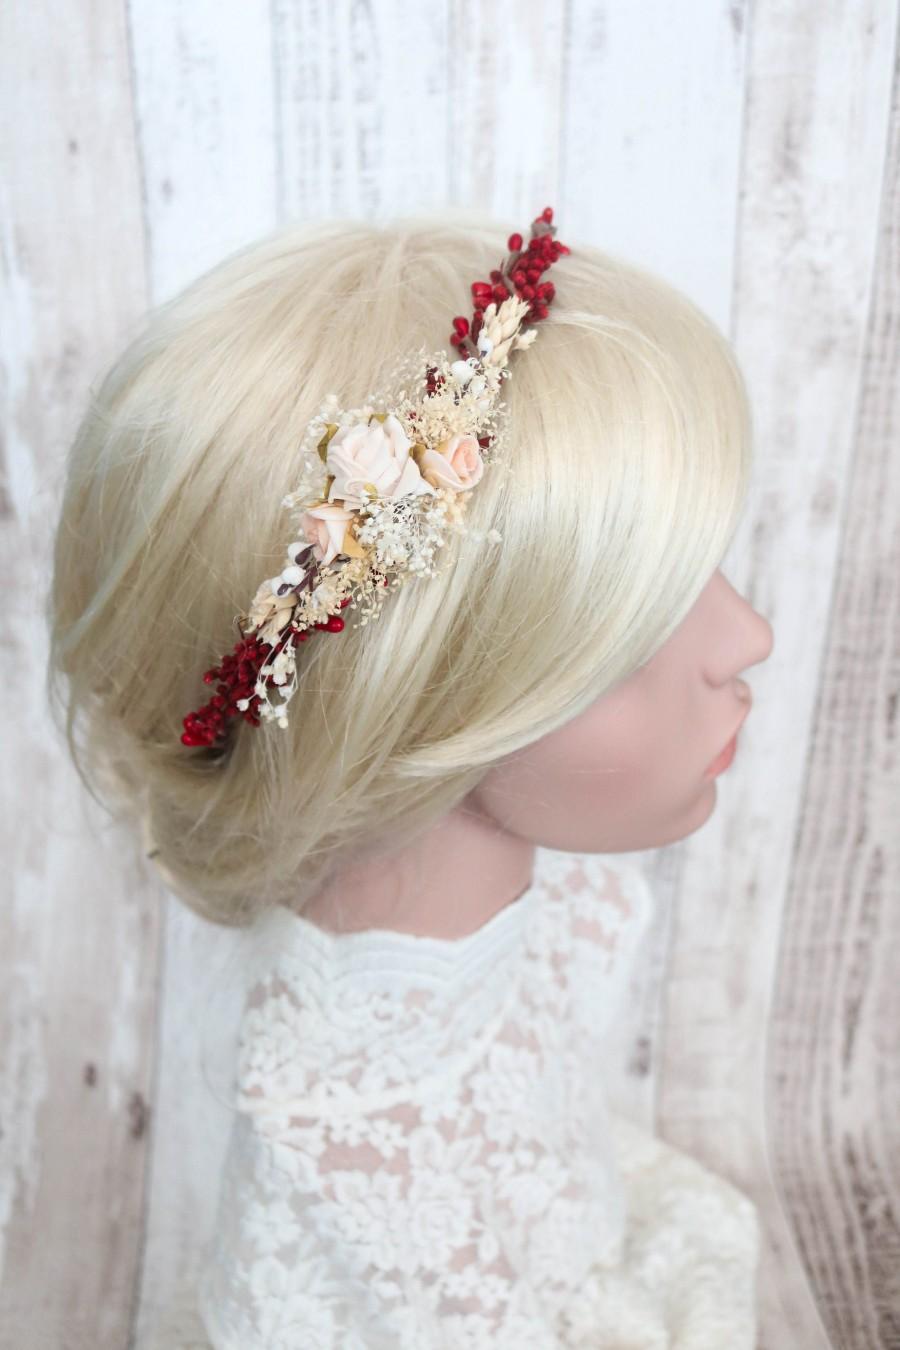 Mariage - LIA - flower hair wreath, wedding crown, headband, bridal side crown